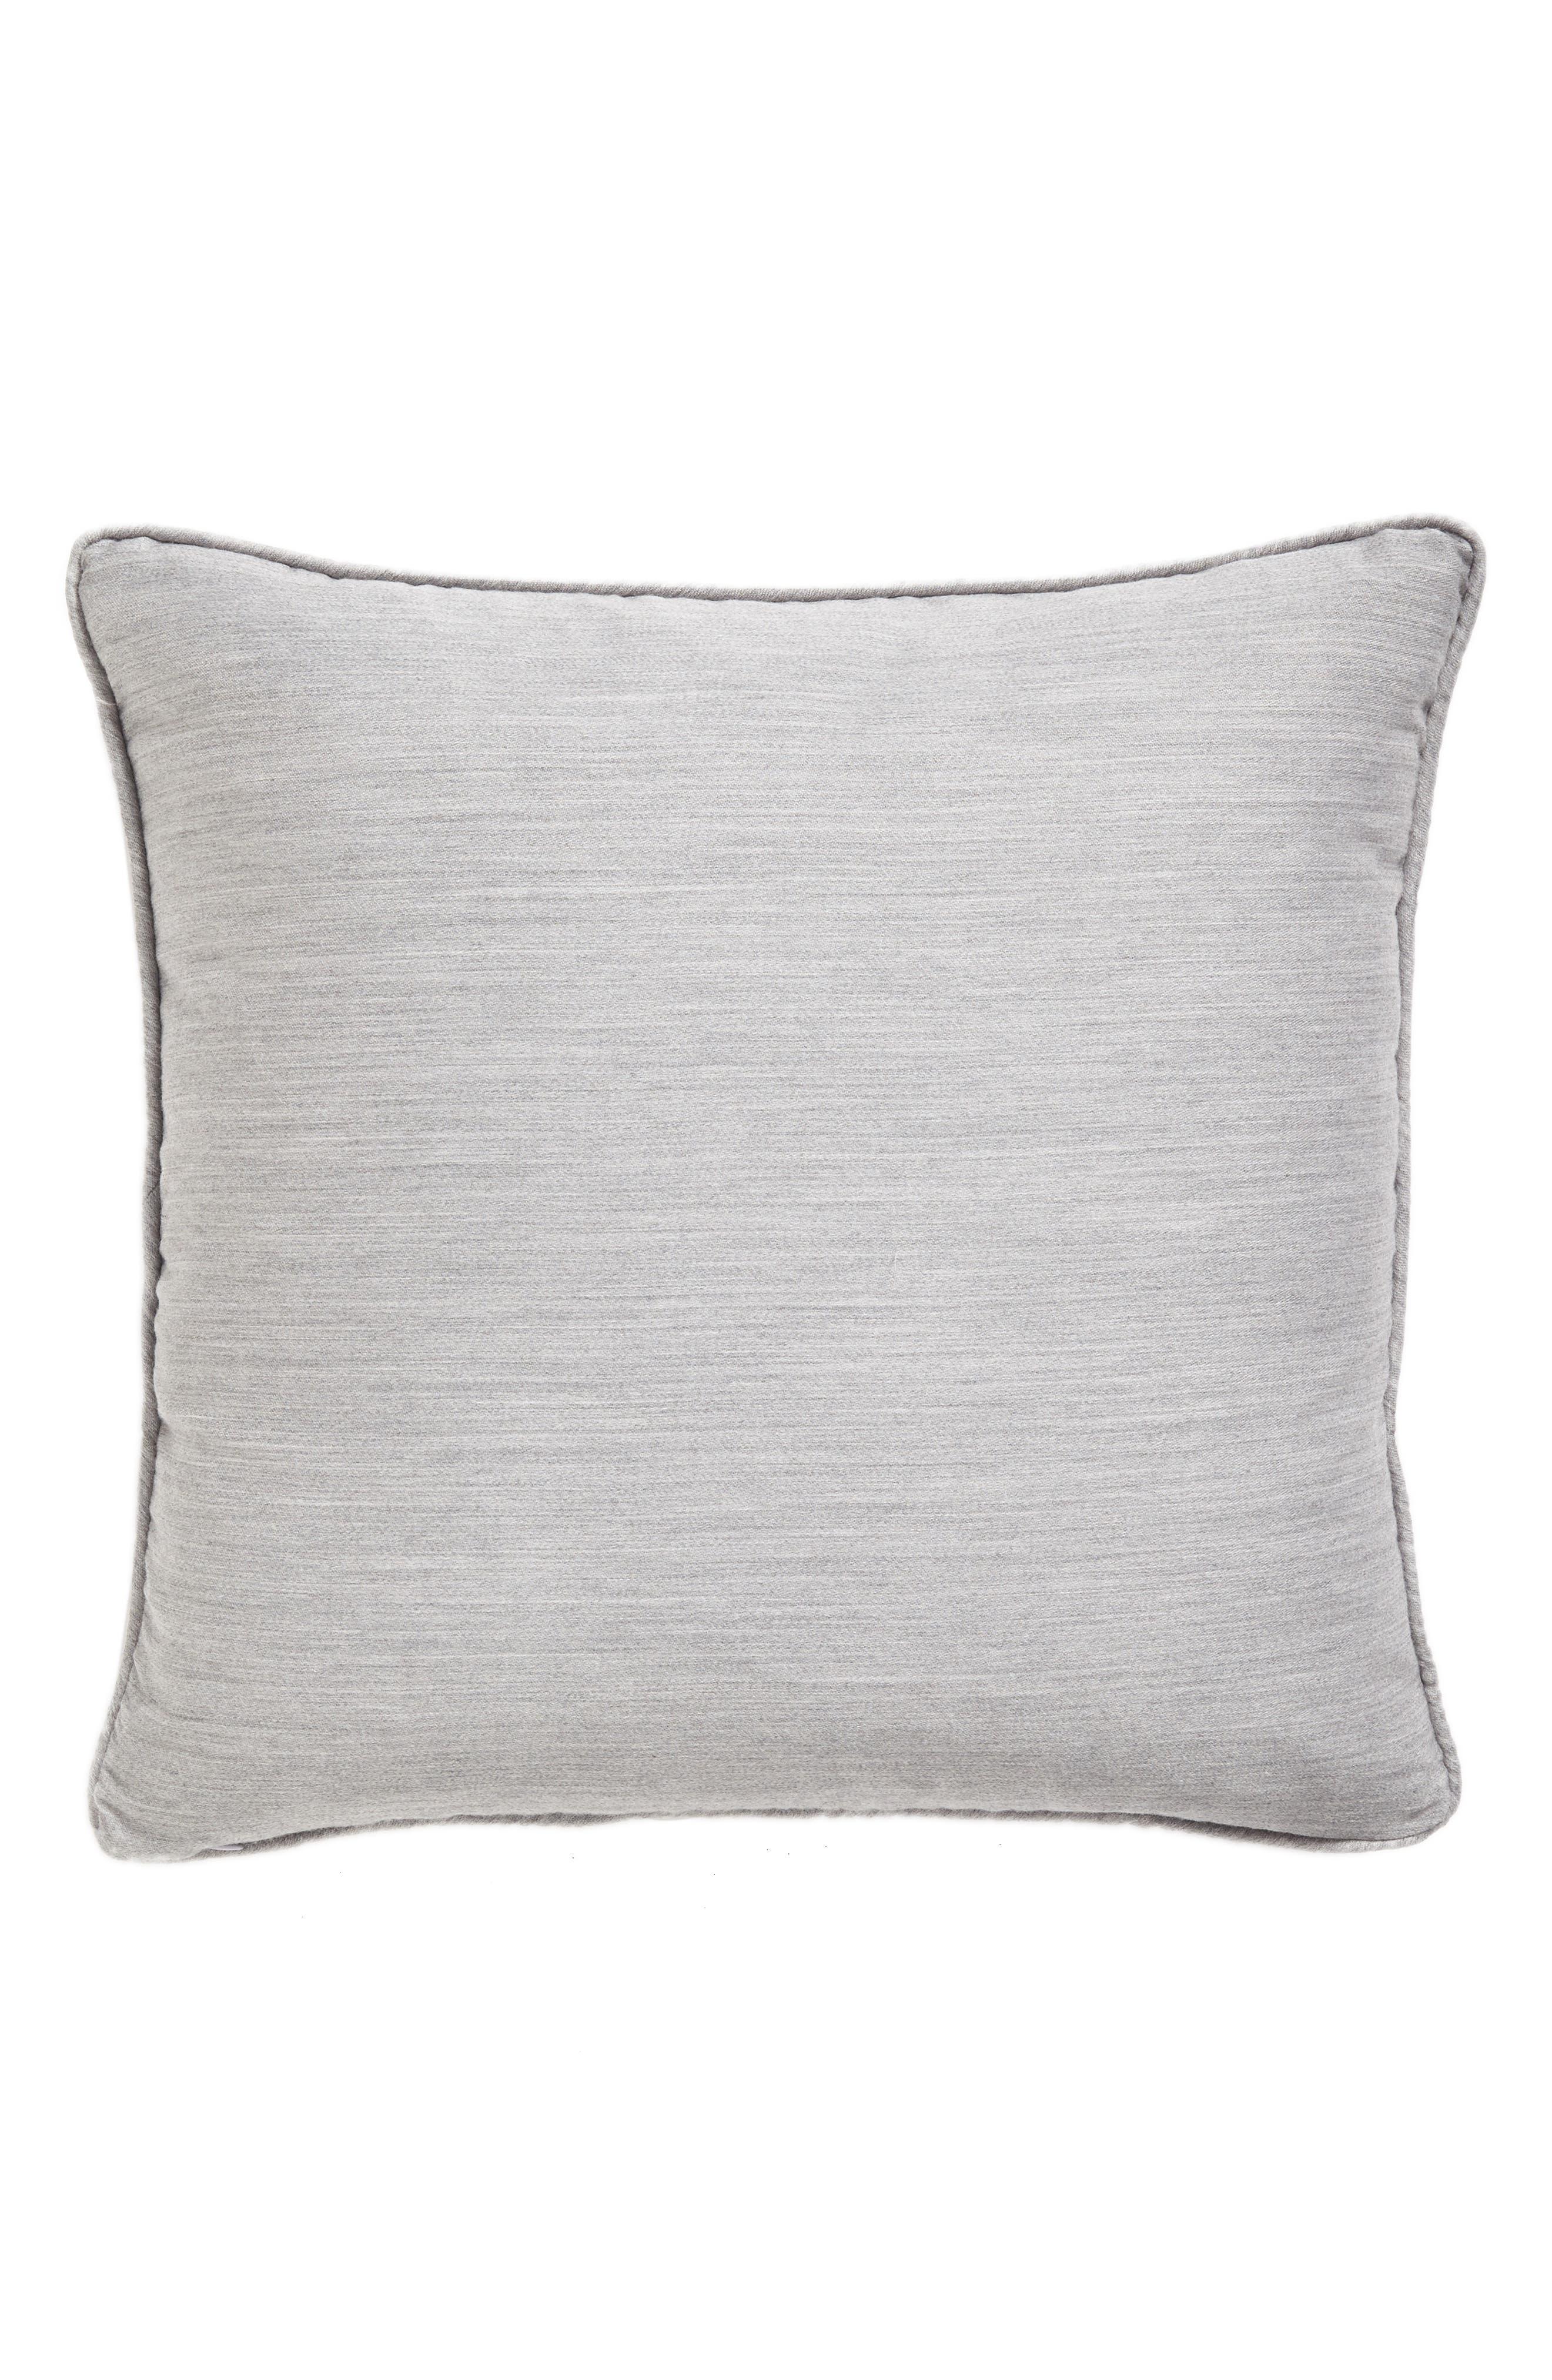 Brione Accent Pillow,                         Main,                         color, ALUMINUM